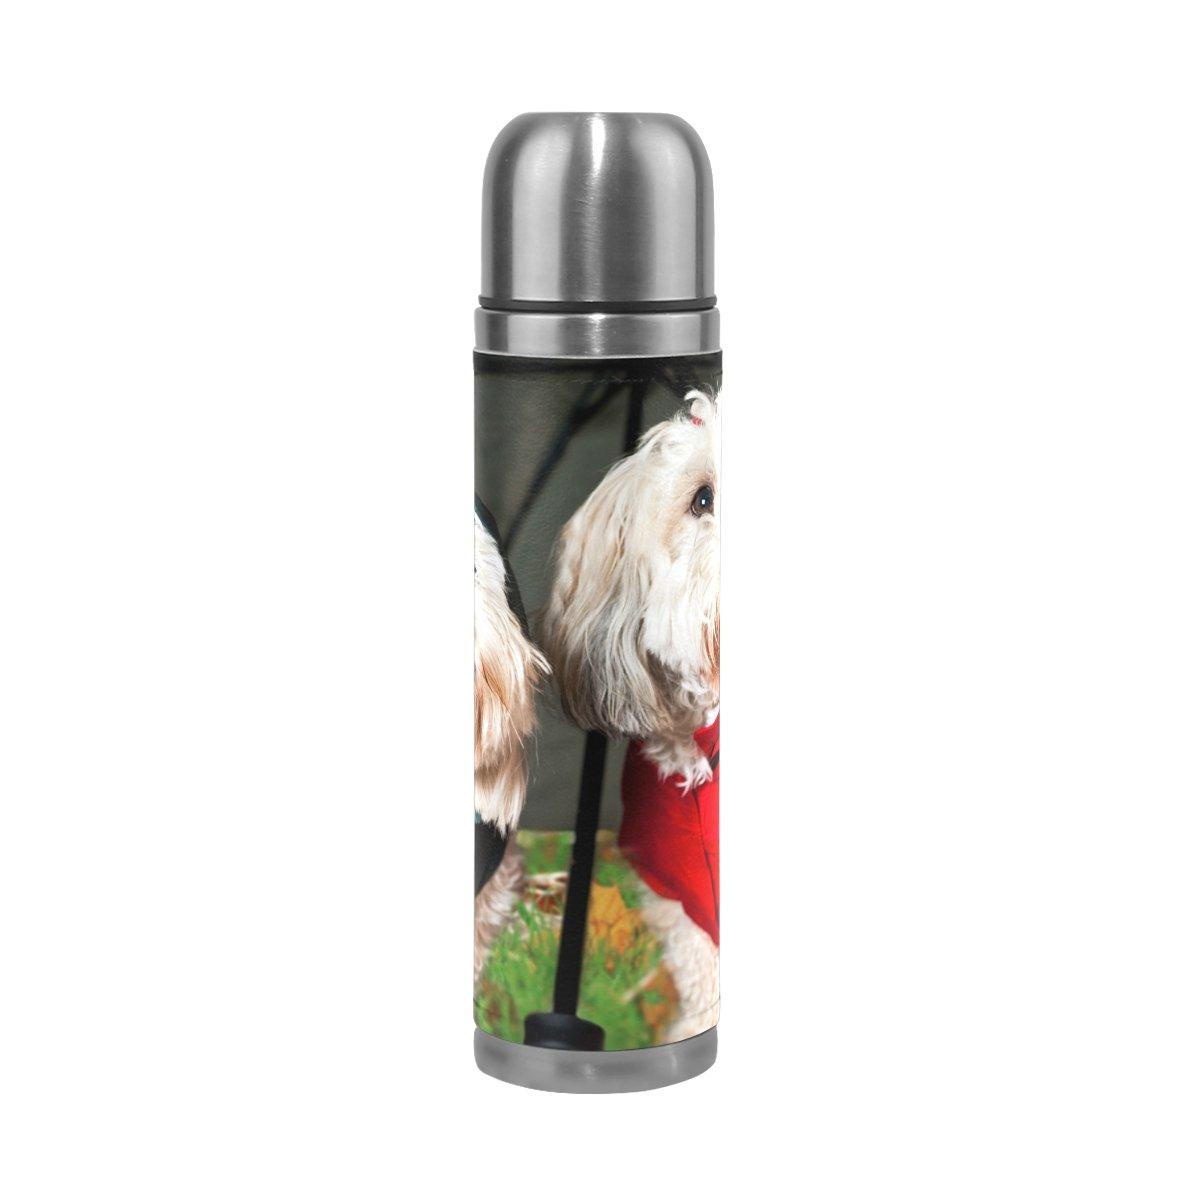 deyyaカスタム印刷誕生日ギフト、Dressed Up犬under傘ステンレススチール真空ウォーターボトルコーヒーマグ旅行カップ、17オンス B076D316DK